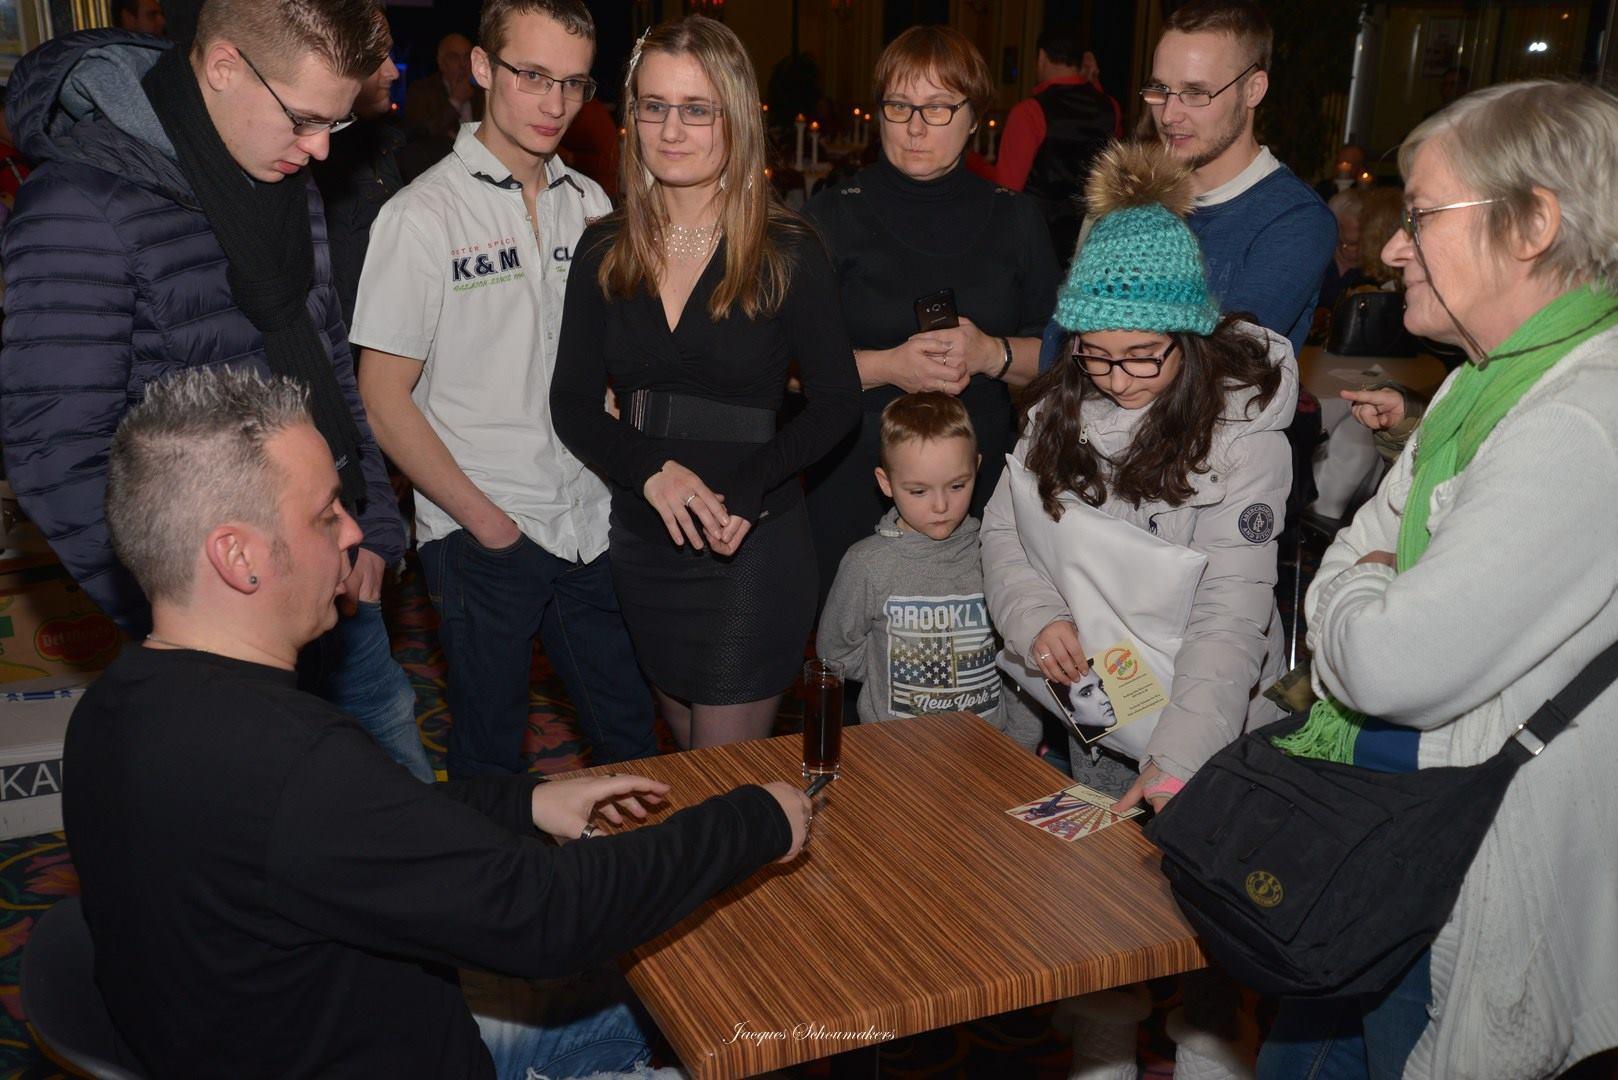 sebastian-for-elvis-casino-de-spa-happy-birthday-elvis-facebook-70